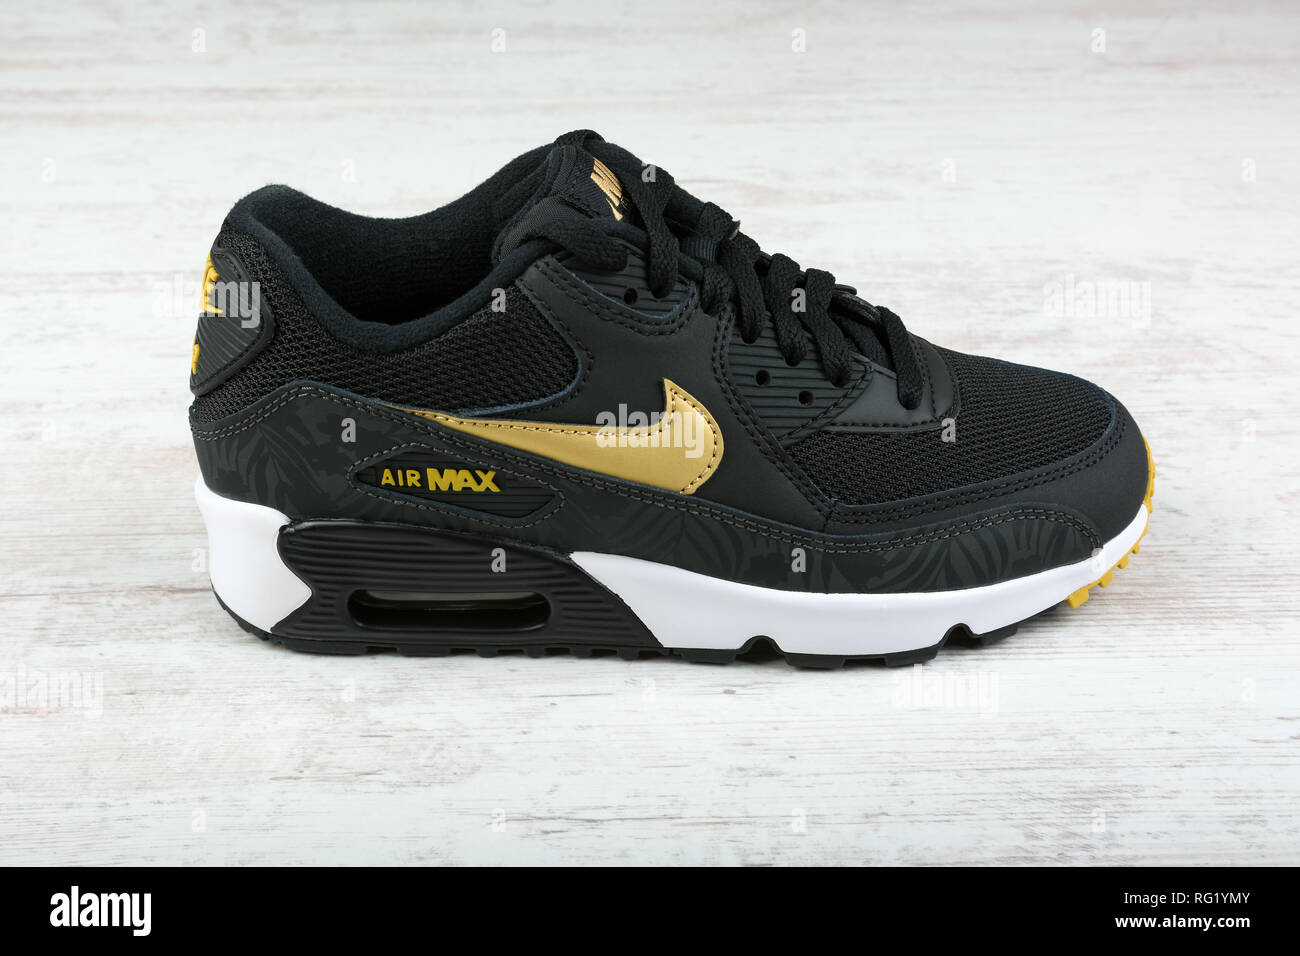 ce3f065049 BURGAS, BULGARIA - DECEMBER 29, 2016: Nike Air MAX women's shoes - sneakers